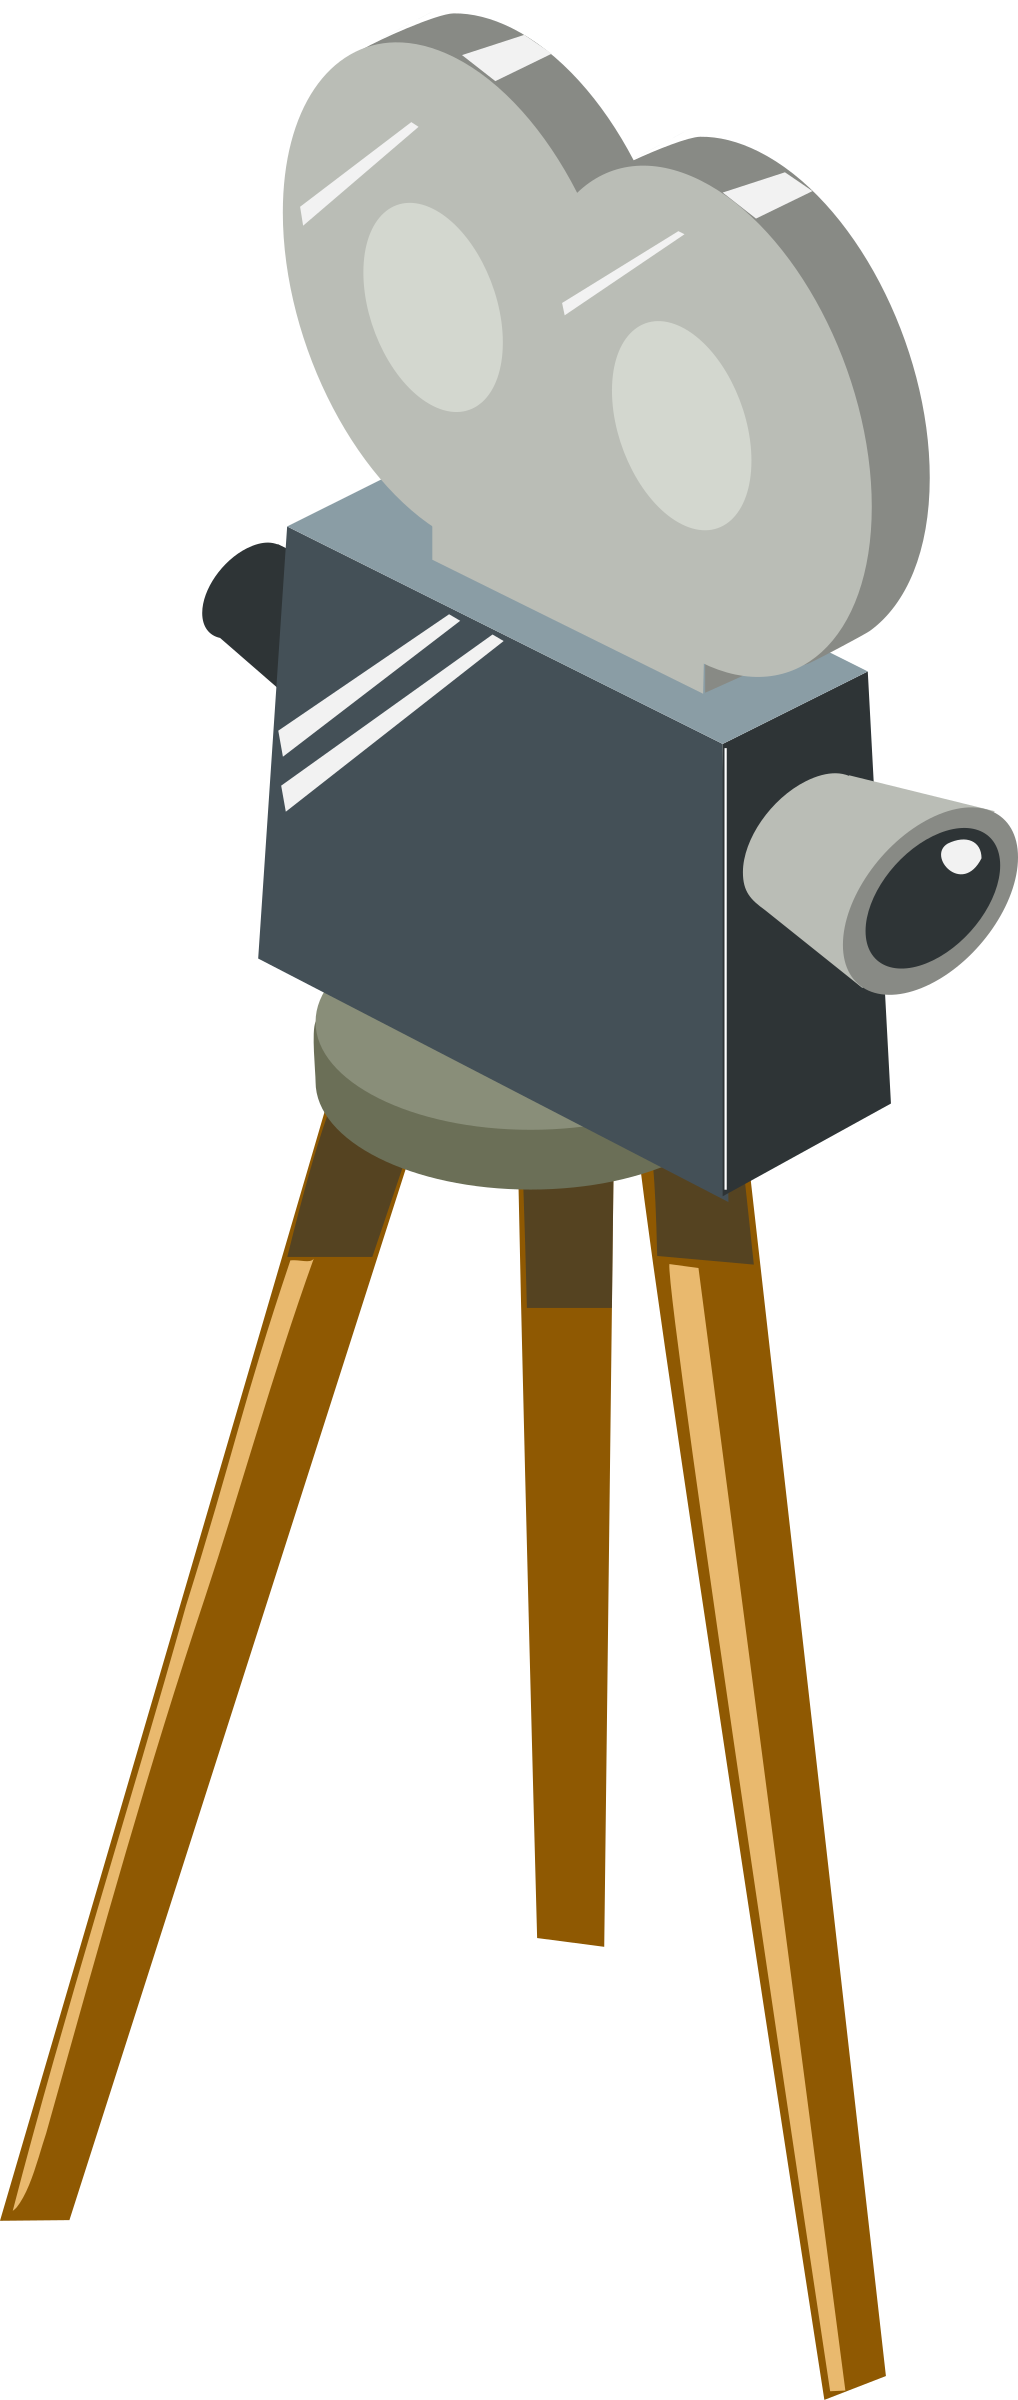 Film clipart camera roll. Cartoon movie big image